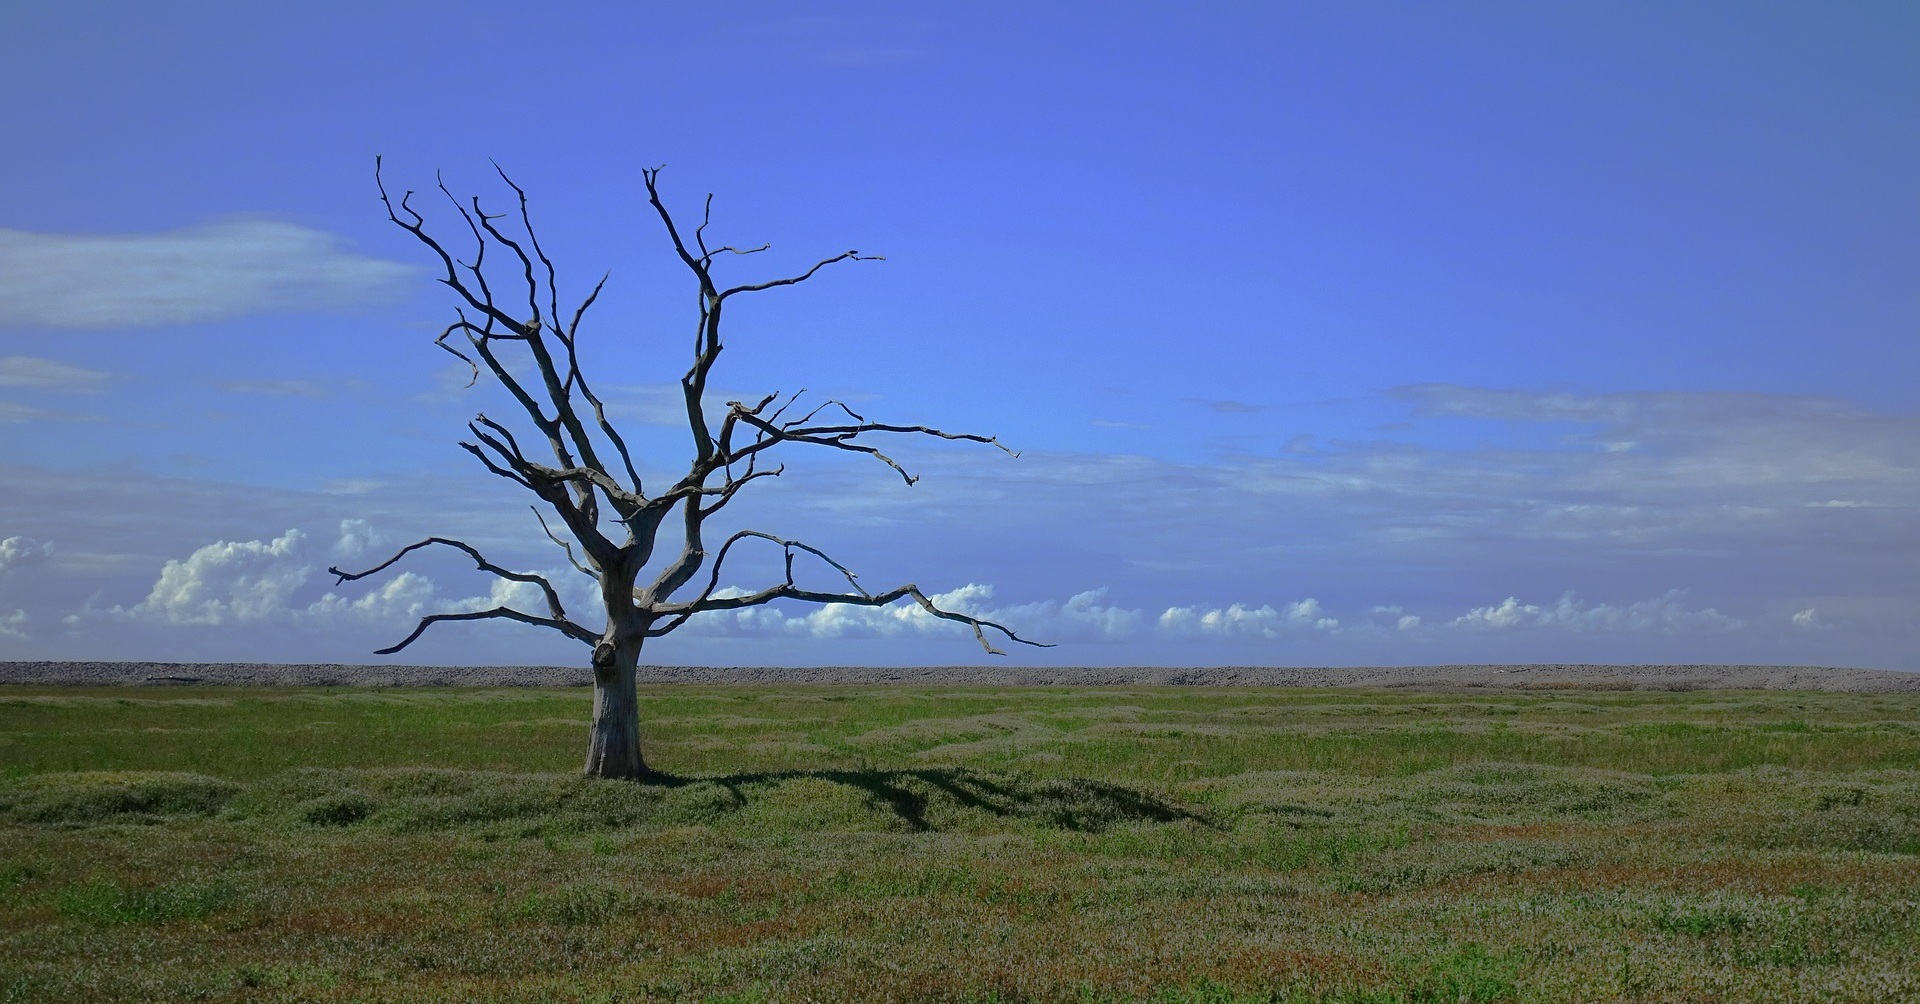 tree-2649411_1920.jpg